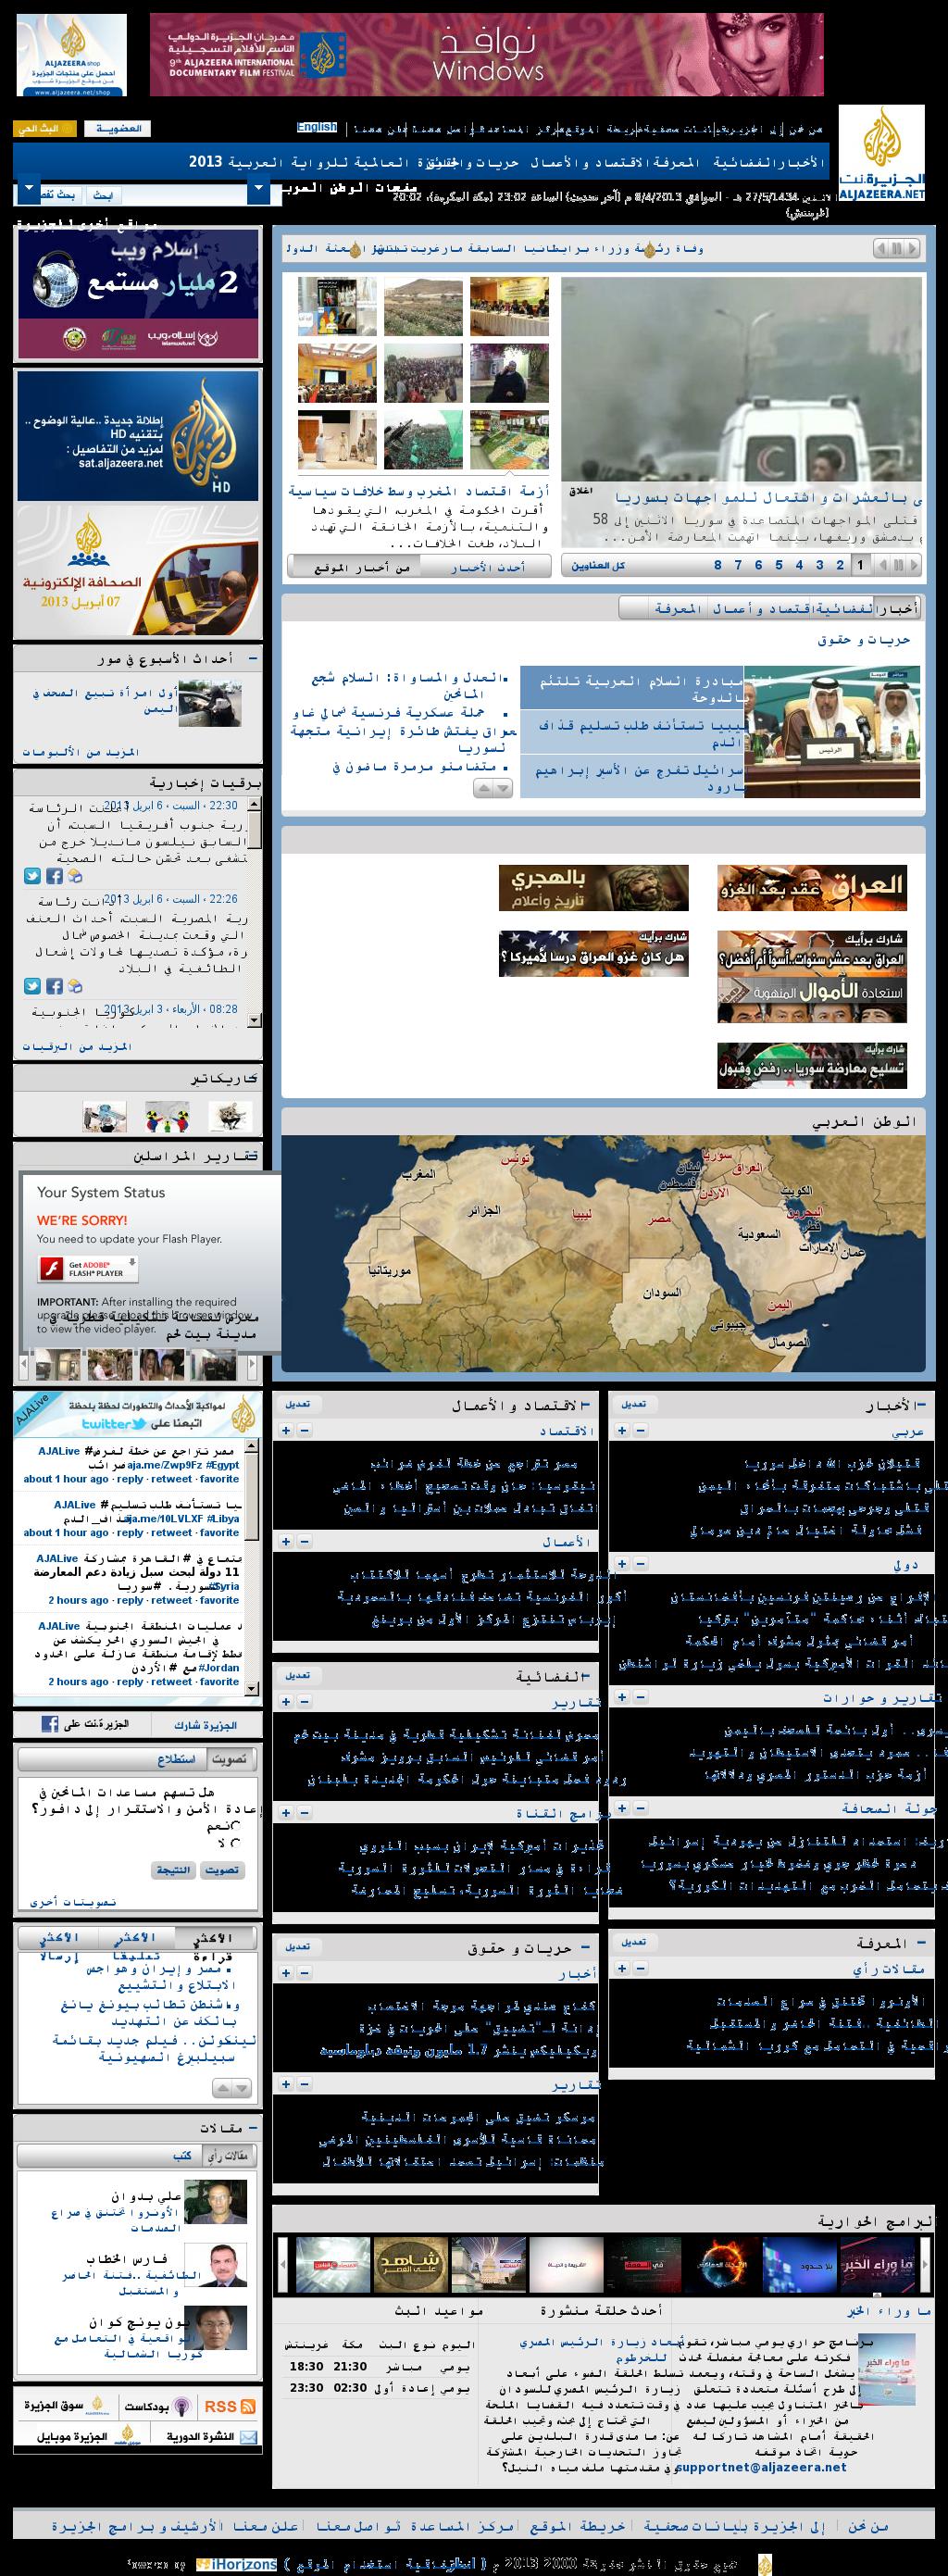 Al Jazeera at Monday April 8, 2013, 8:24 p.m. UTC